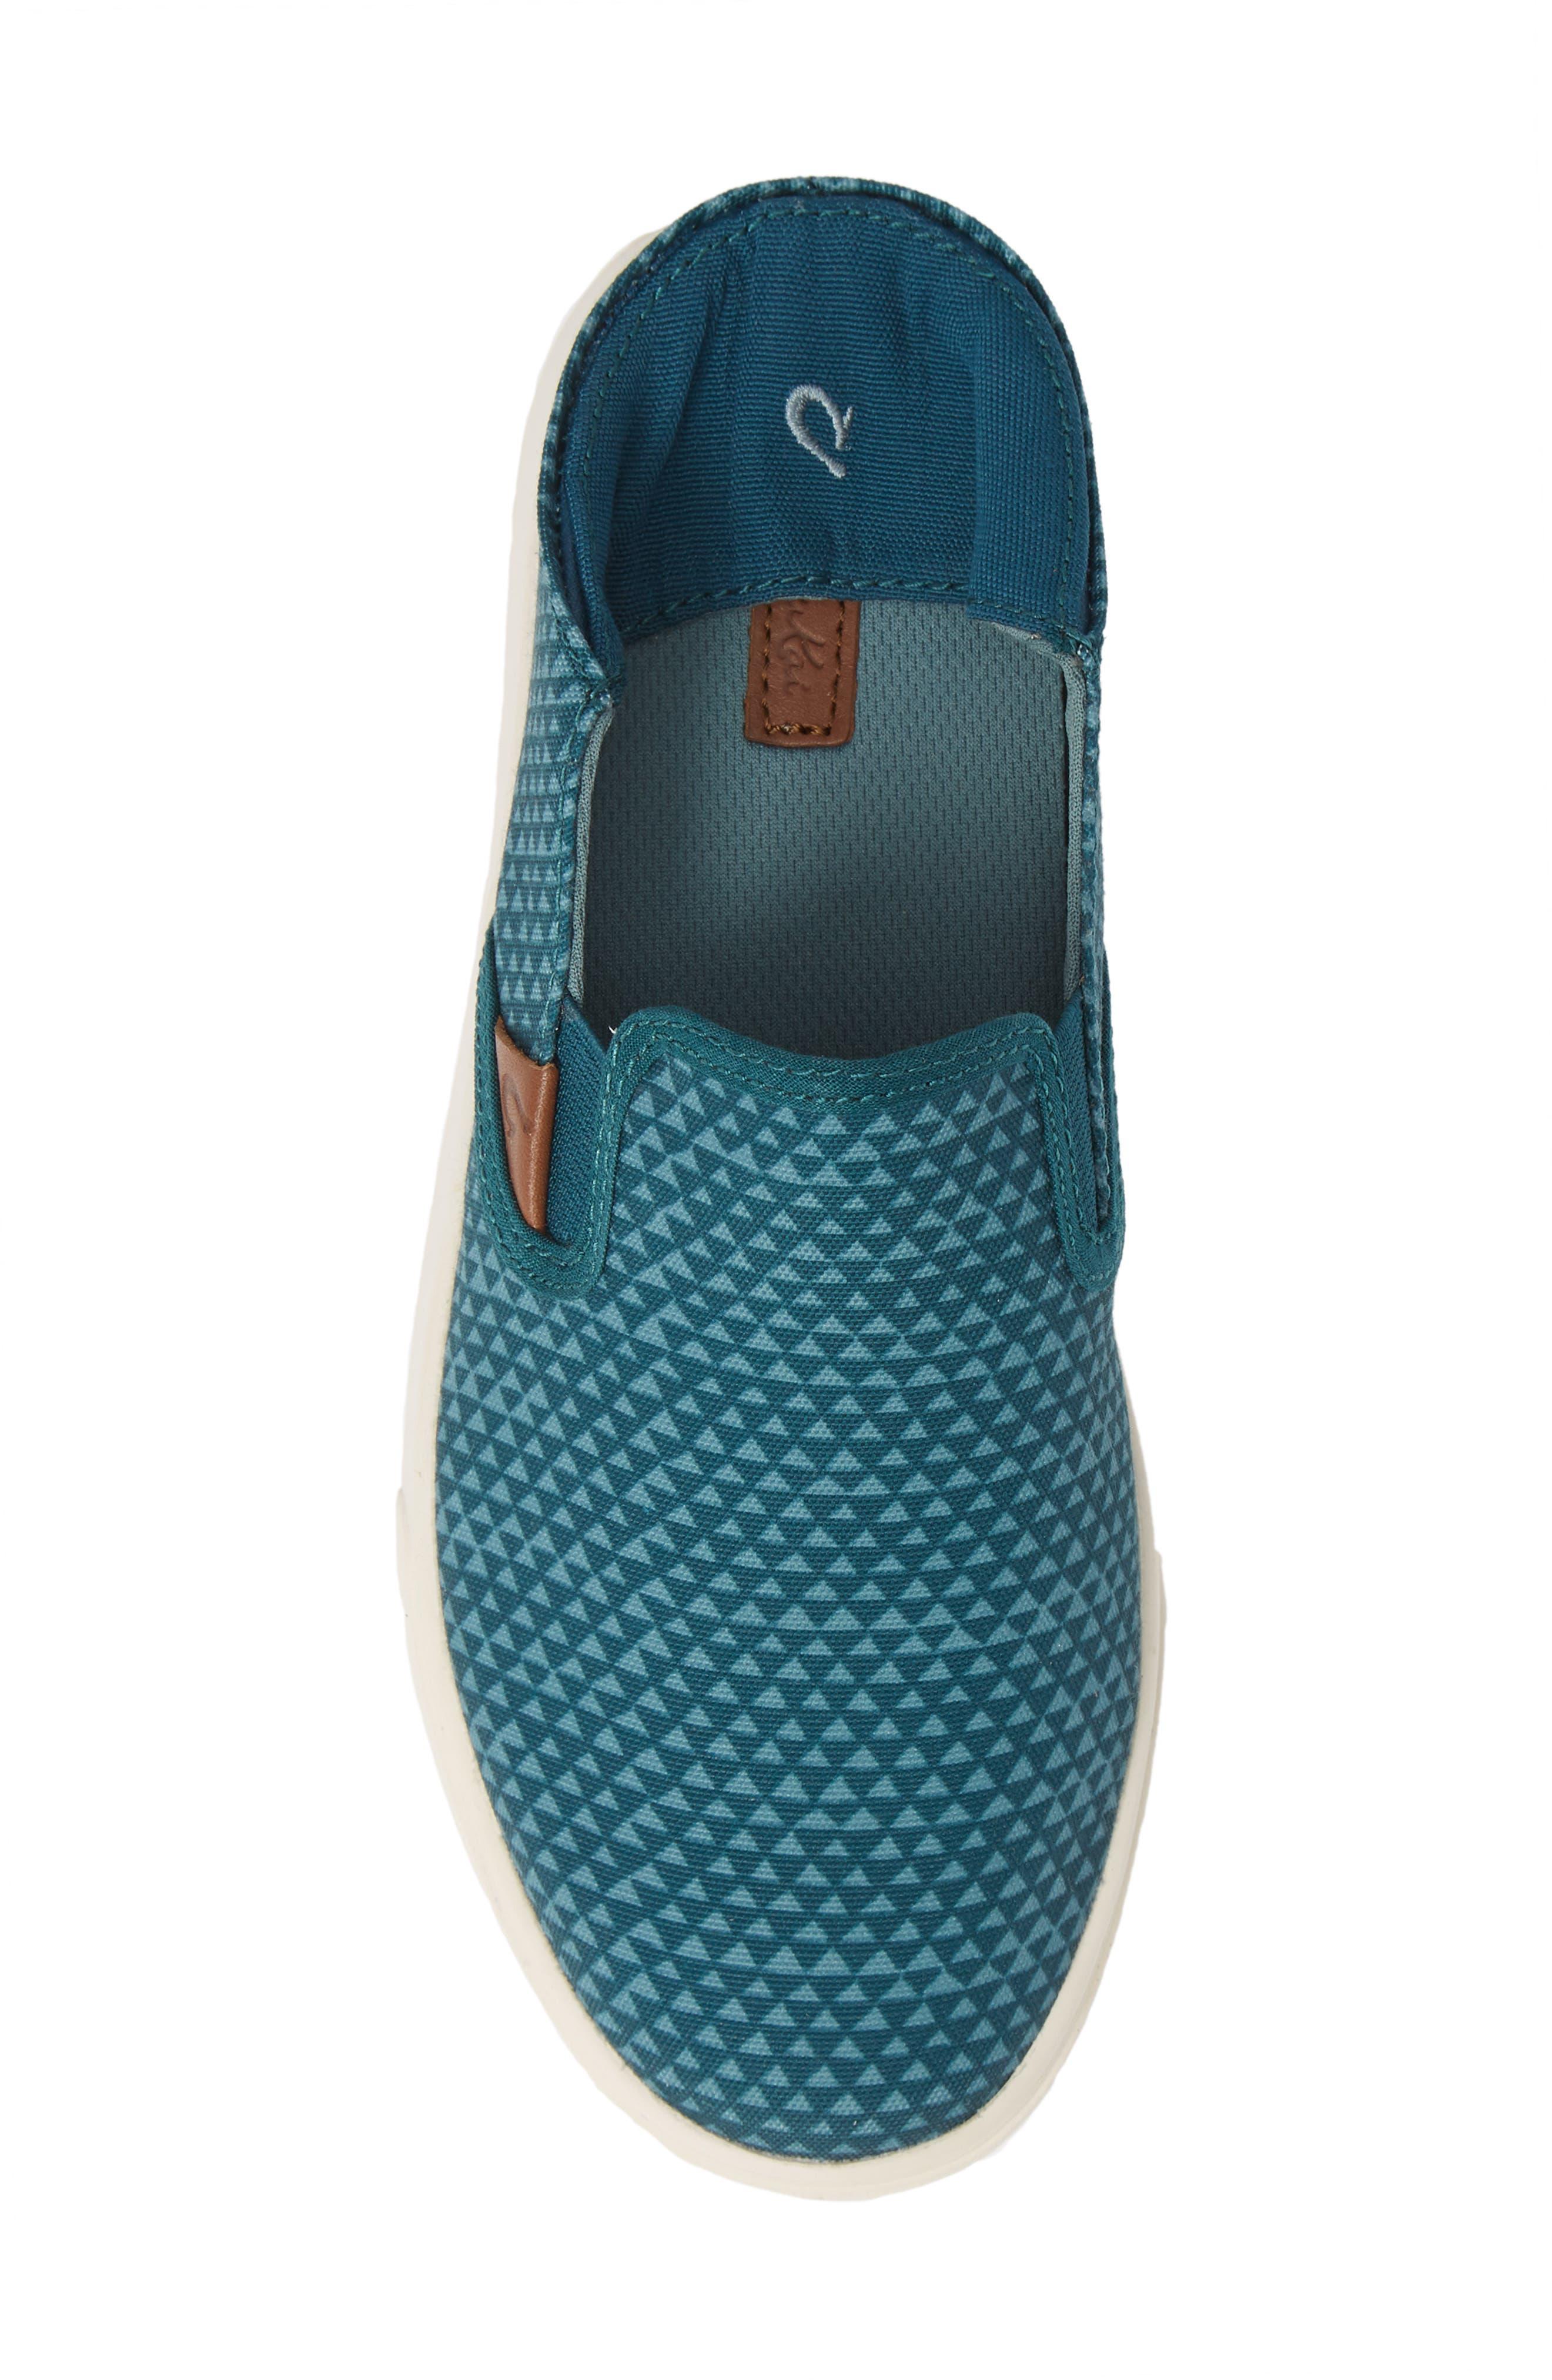 Pehuea Pa'i Convertible Sneaker,                             Alternate thumbnail 6, color,                             DEEP TEAL/ TRIANGLE FABRIC